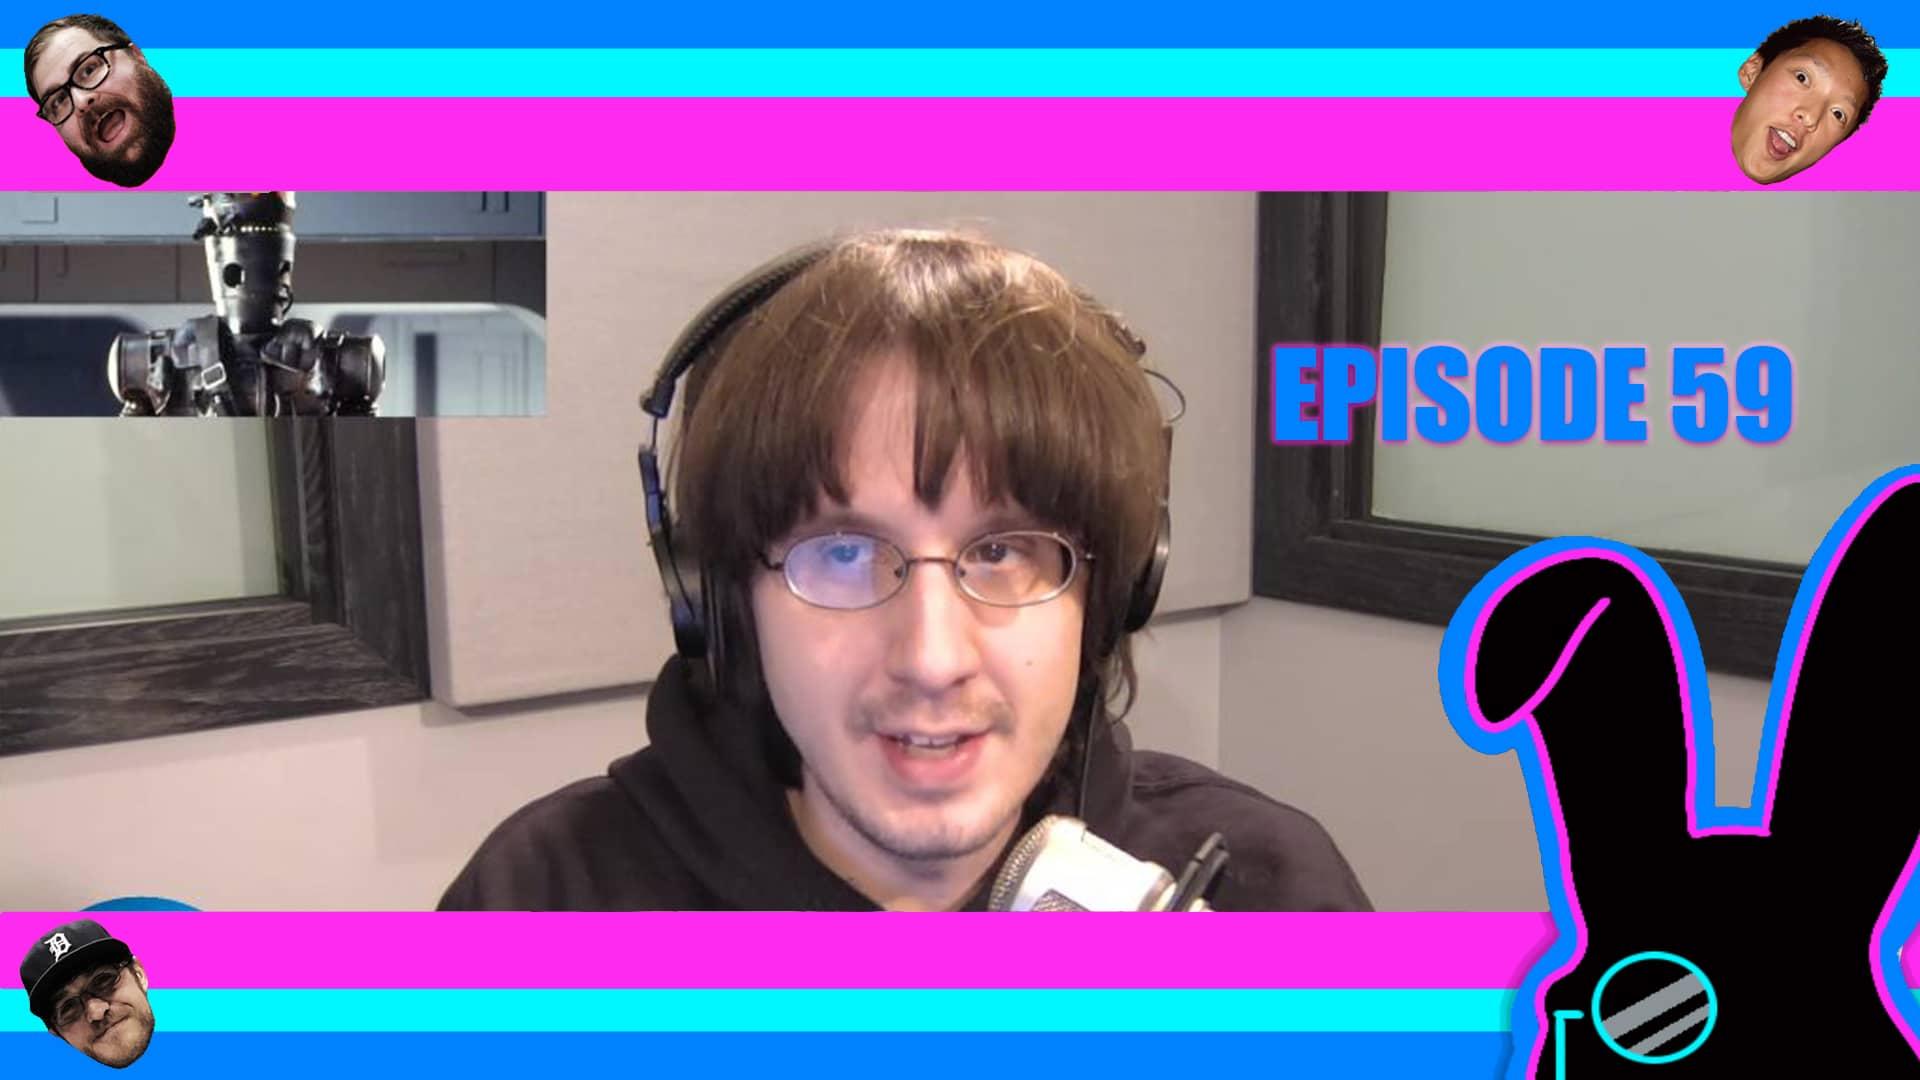 Geektainment Weekly - Episode 59